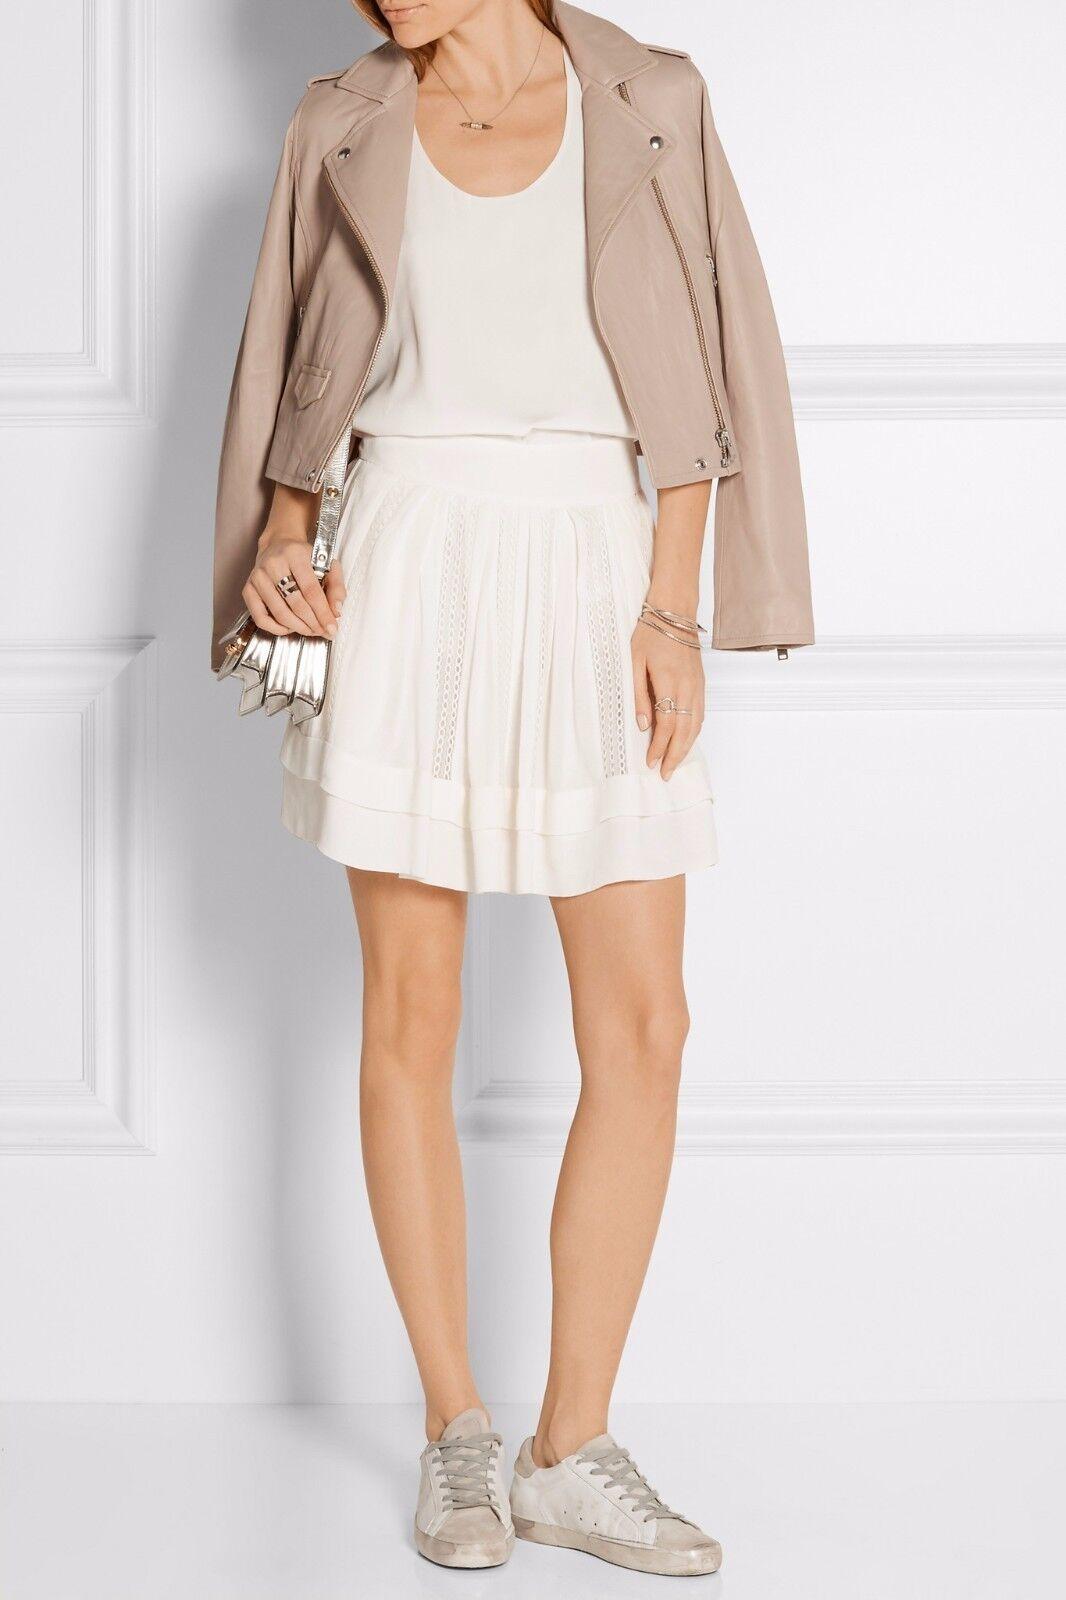 NWT IRO Ginny Crochet-Trimmed Skirt Ecru Size 34,36,38  350